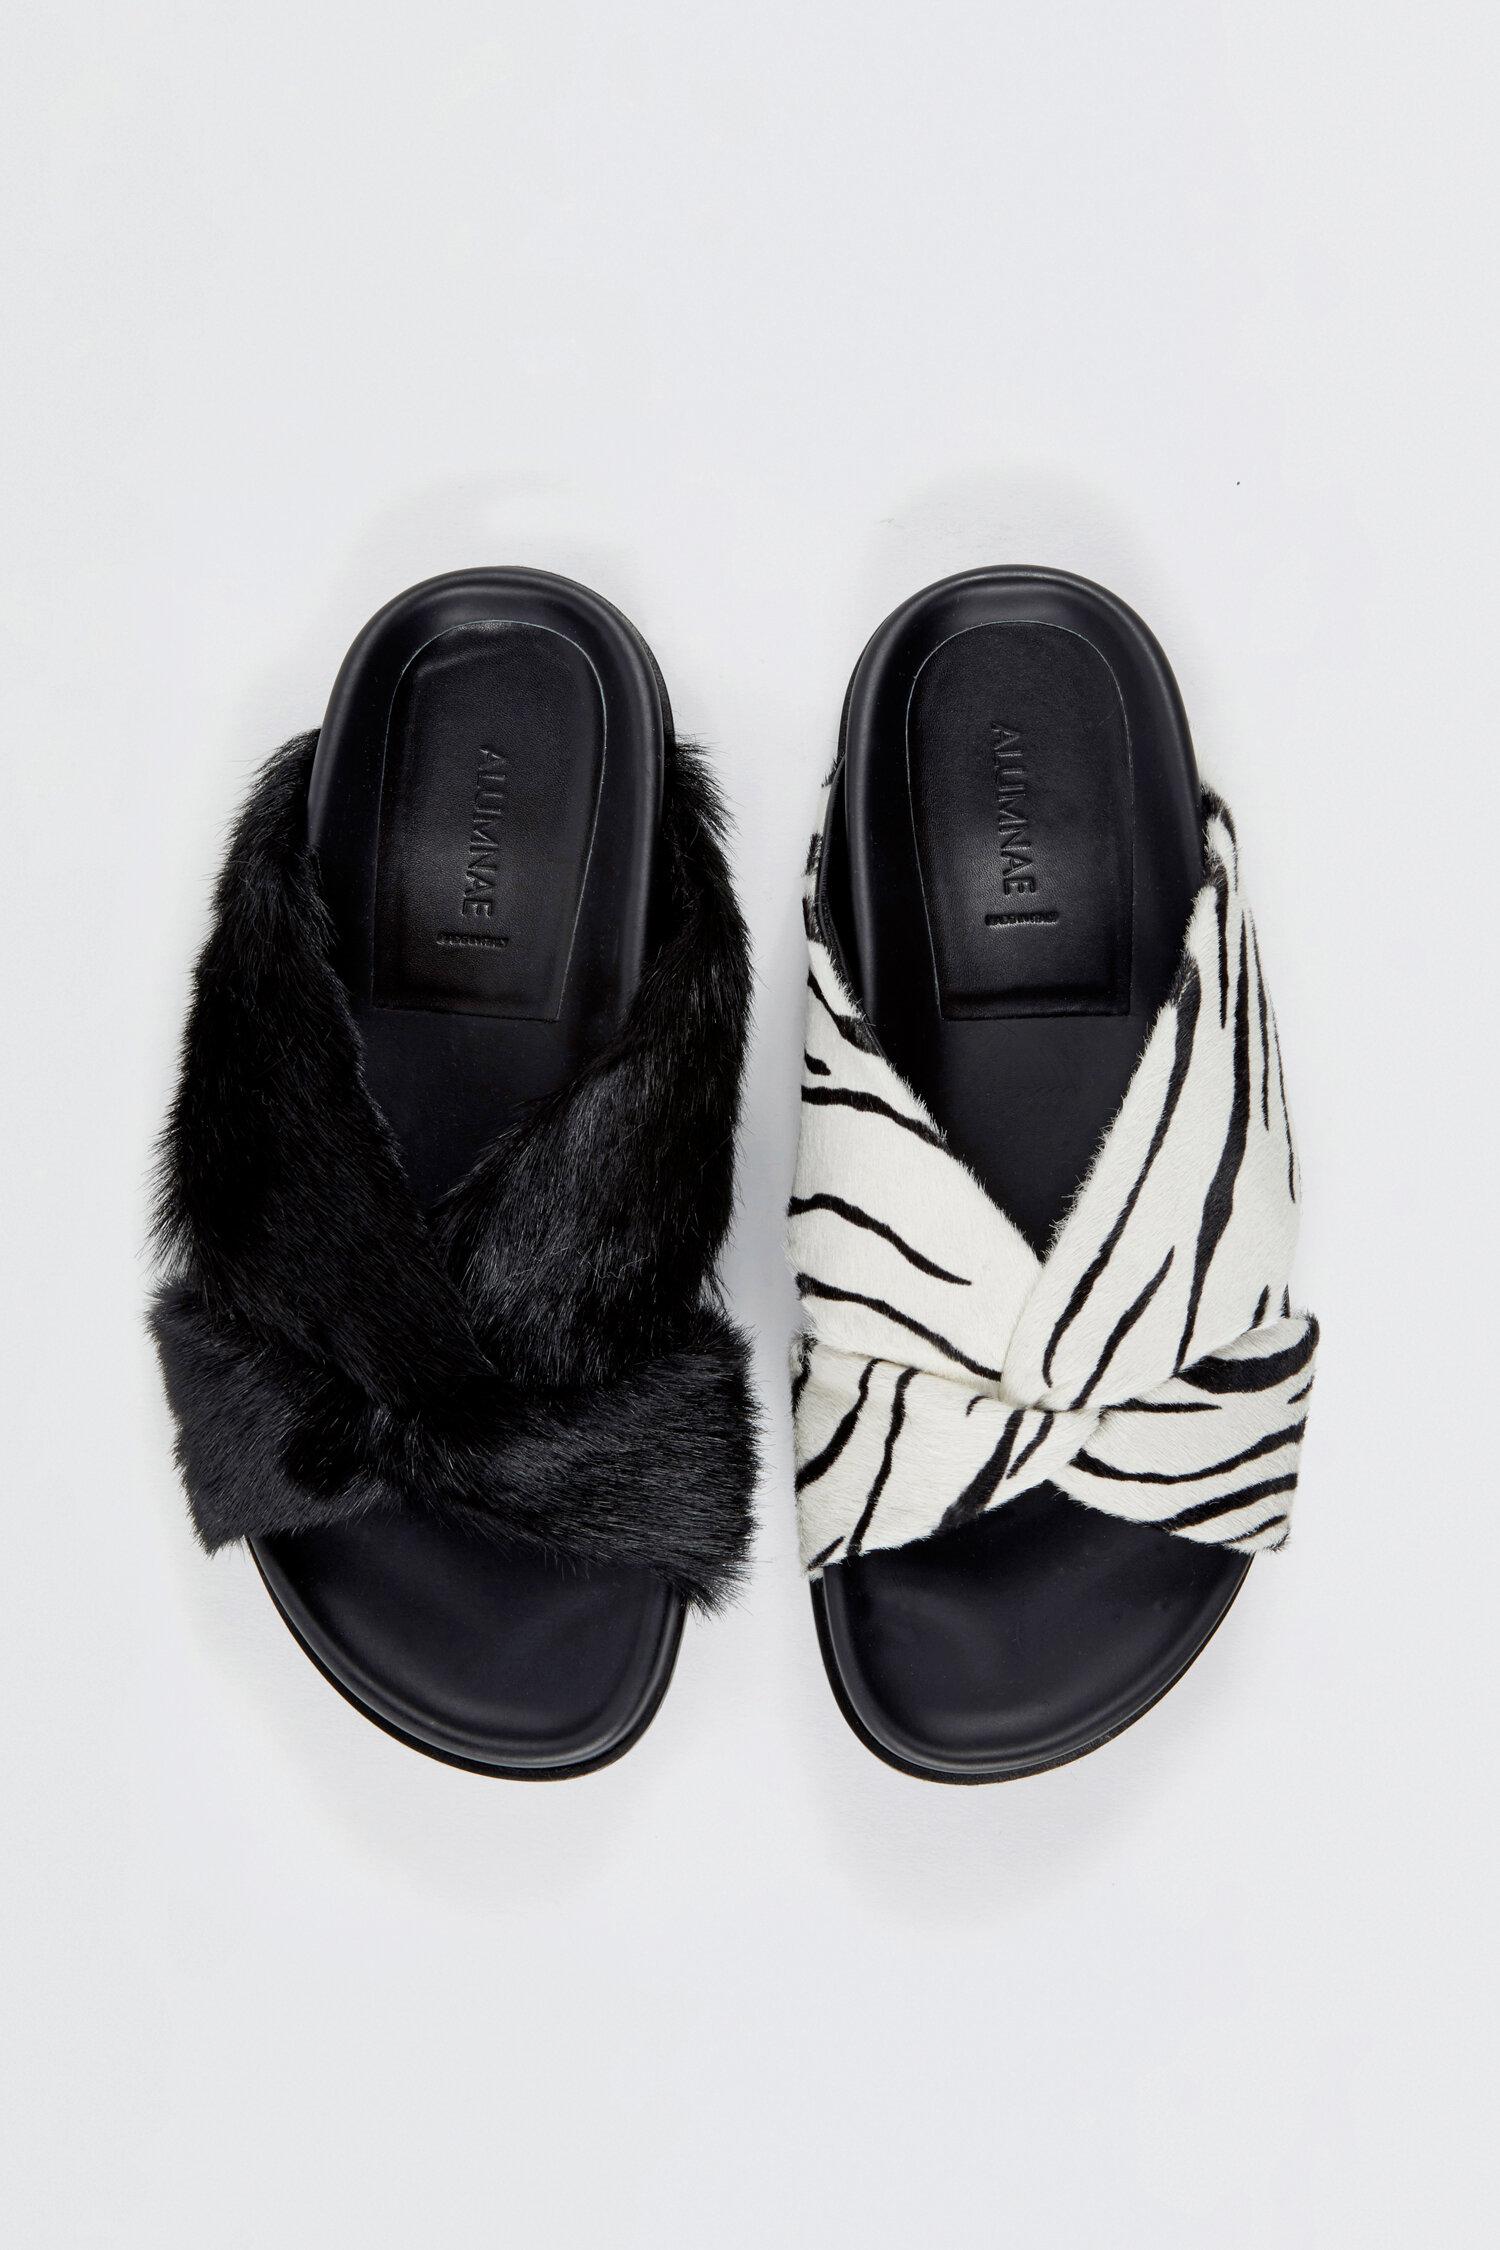 FW19 871 - WOLF BLACK / 871 - ZEBRA BLACK/WHITE -